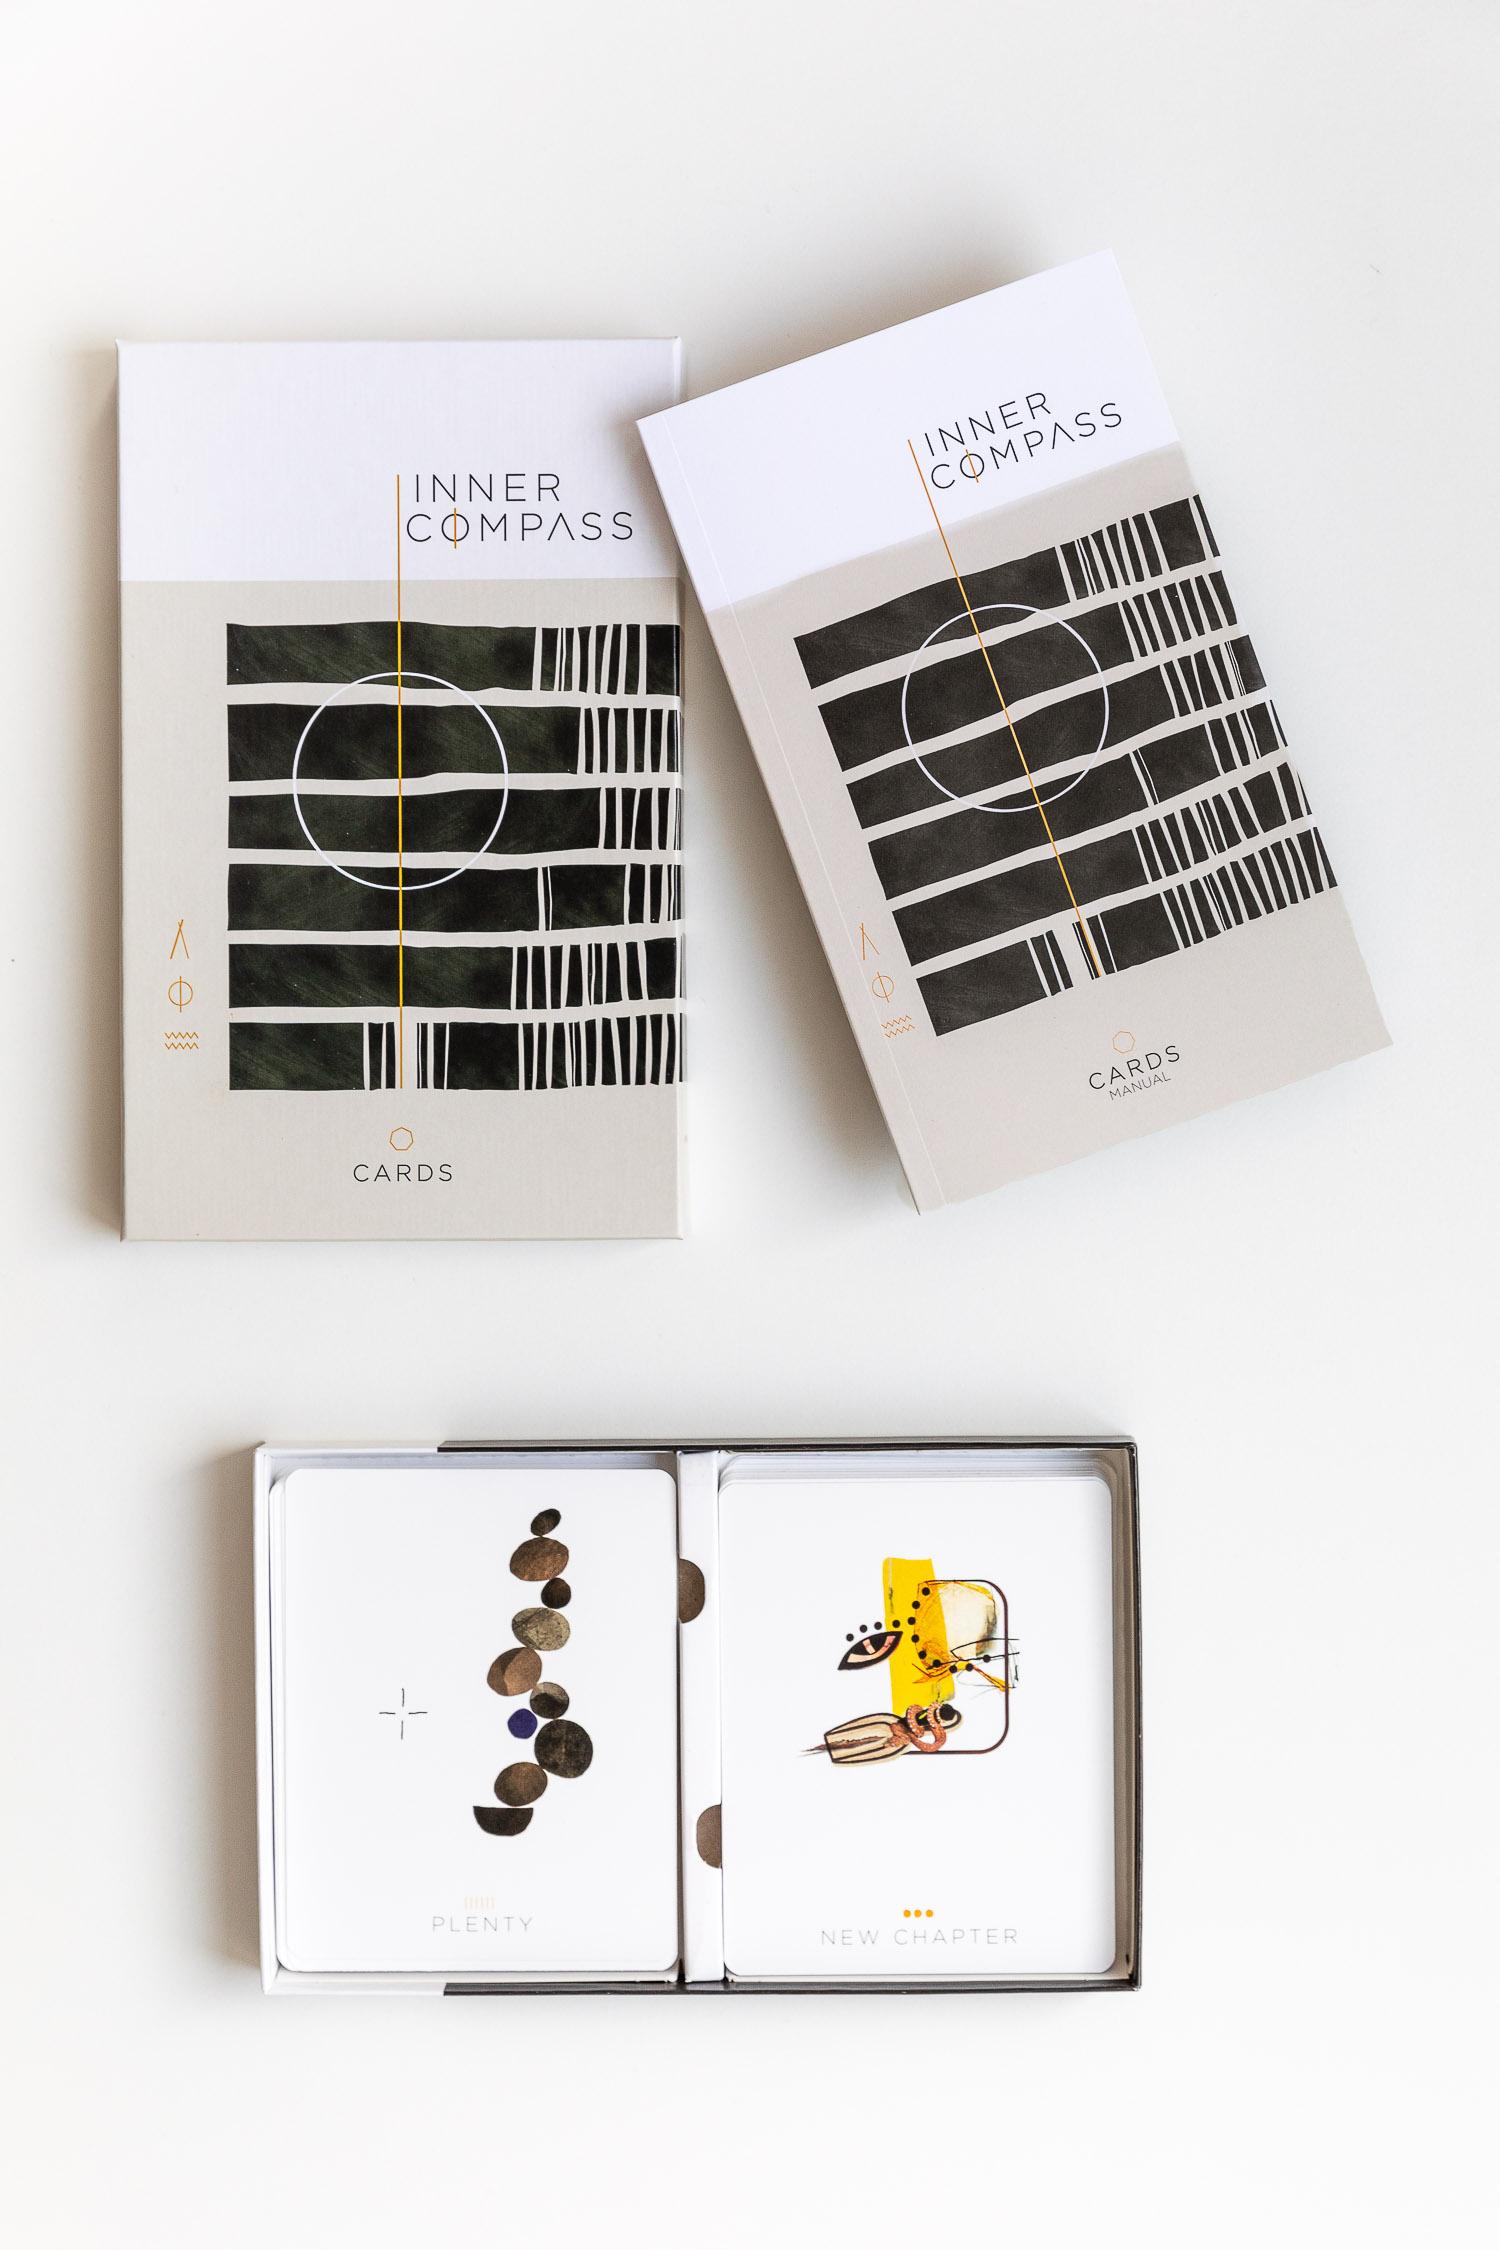 1840-verdenius-inner-compass-cards-72-dpi-143A8113.jpg